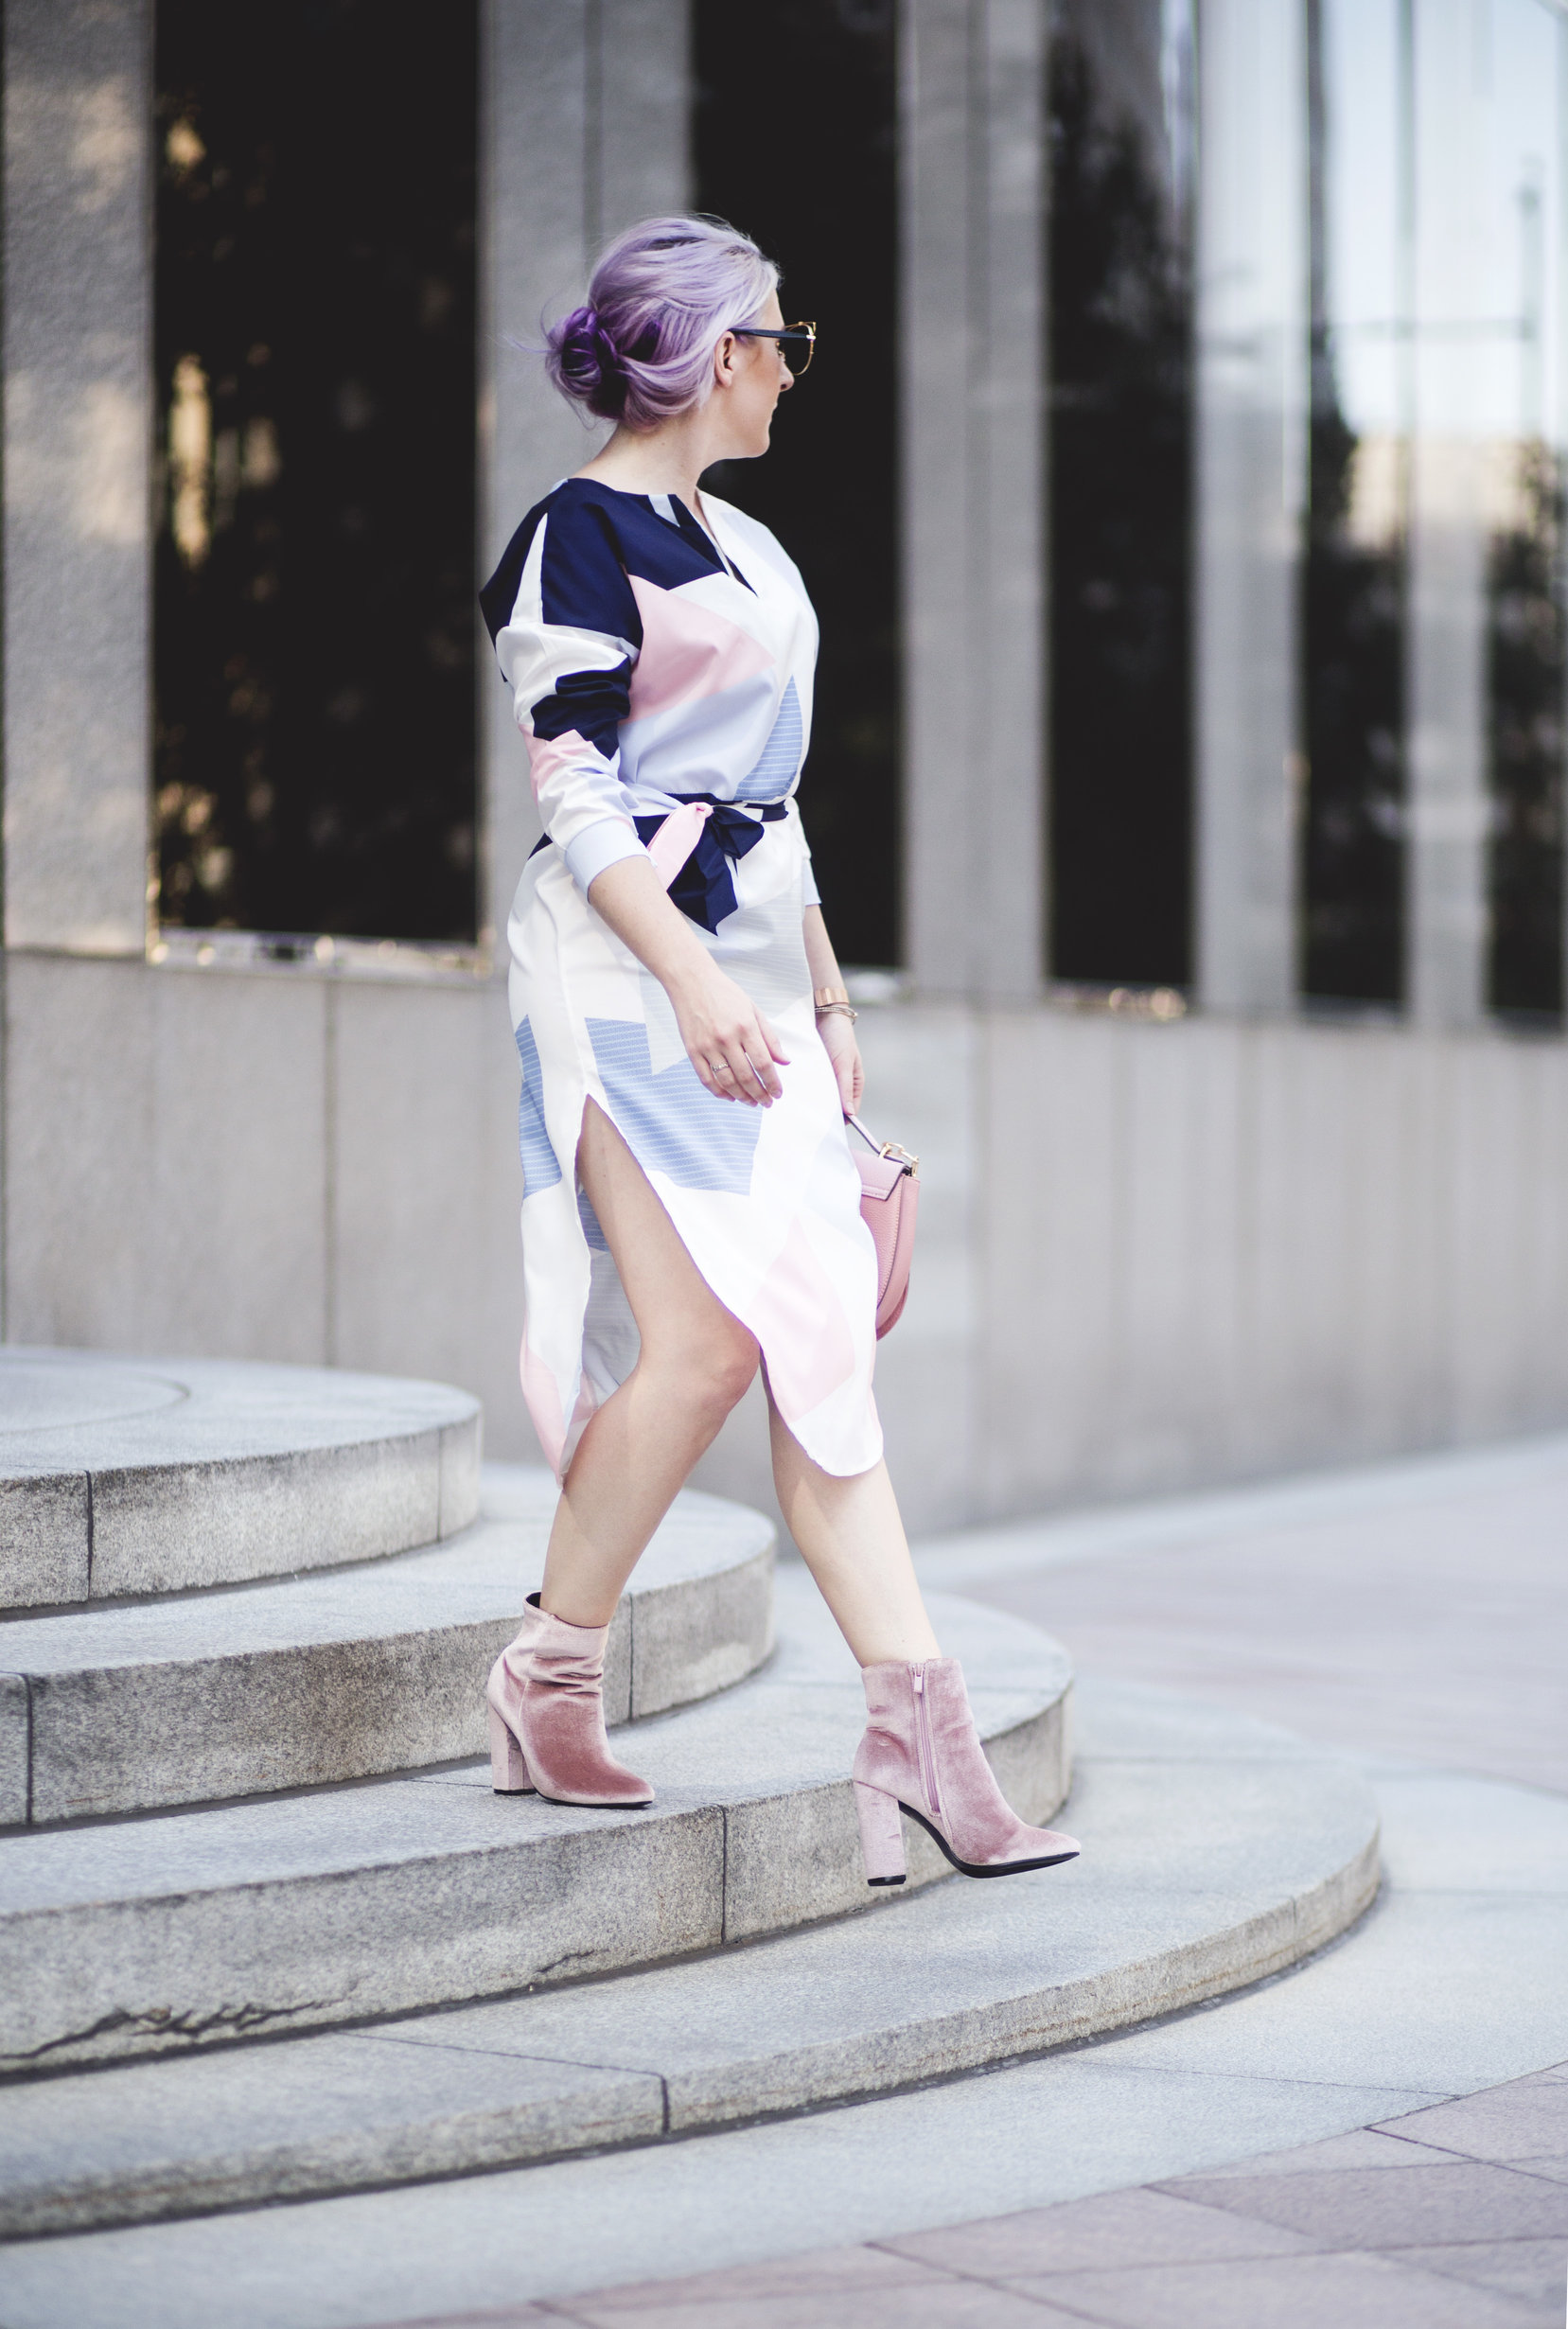 houston blogger, style blogger, fashion blogger